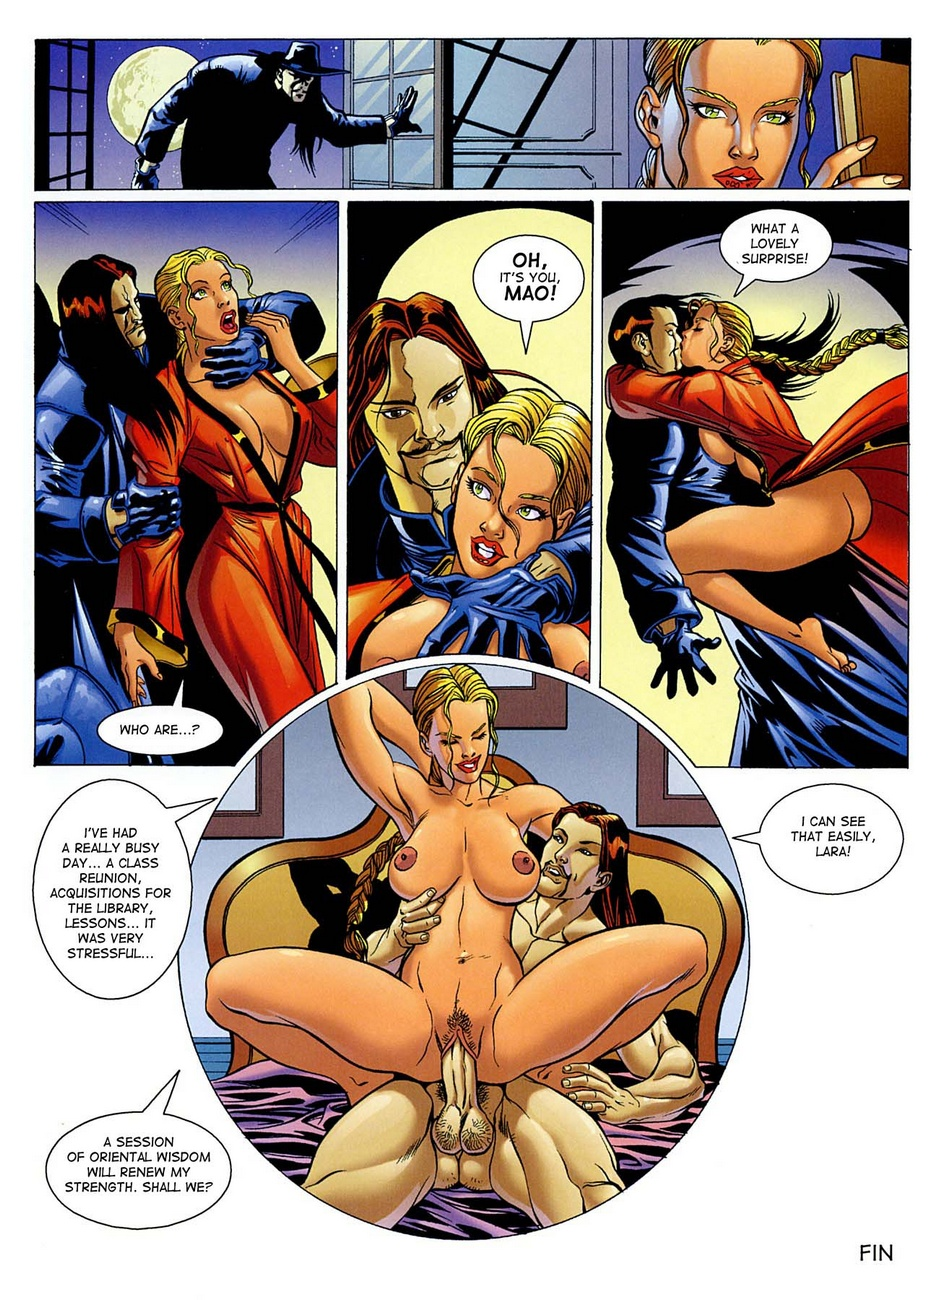 Lara jones comics sex are some